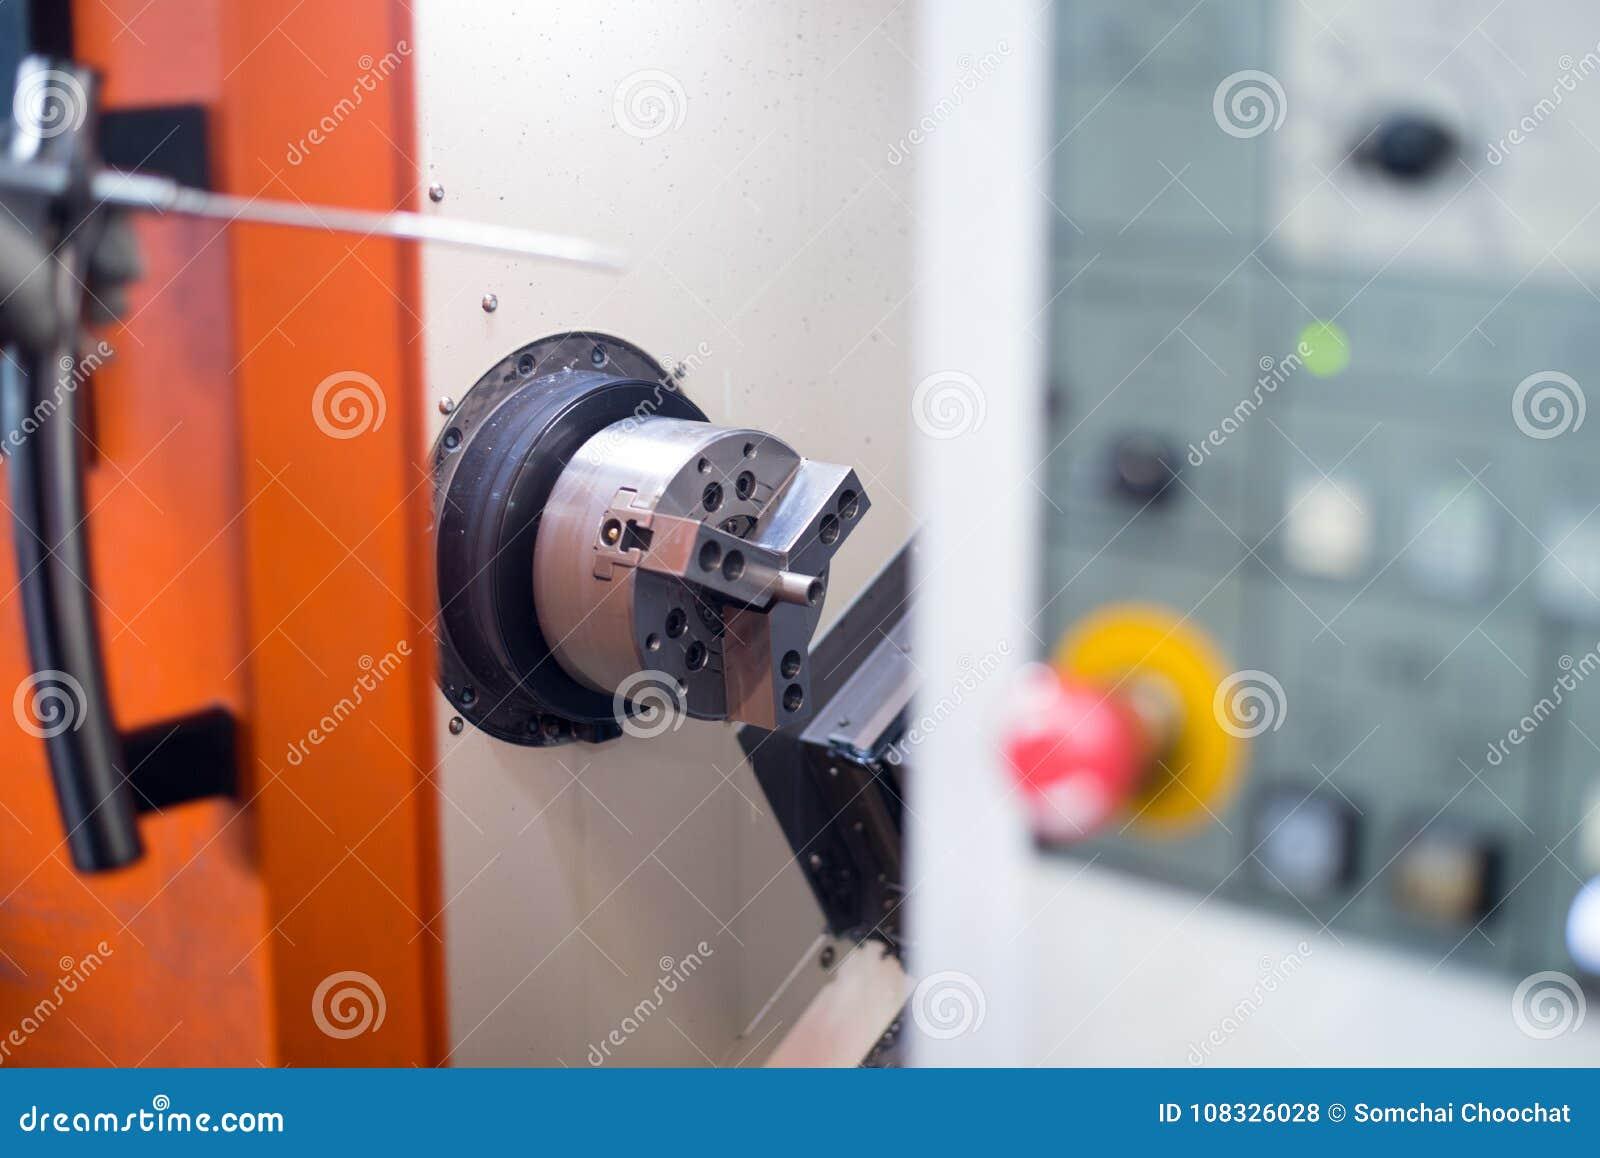 CNC Lathe in manufacturing process